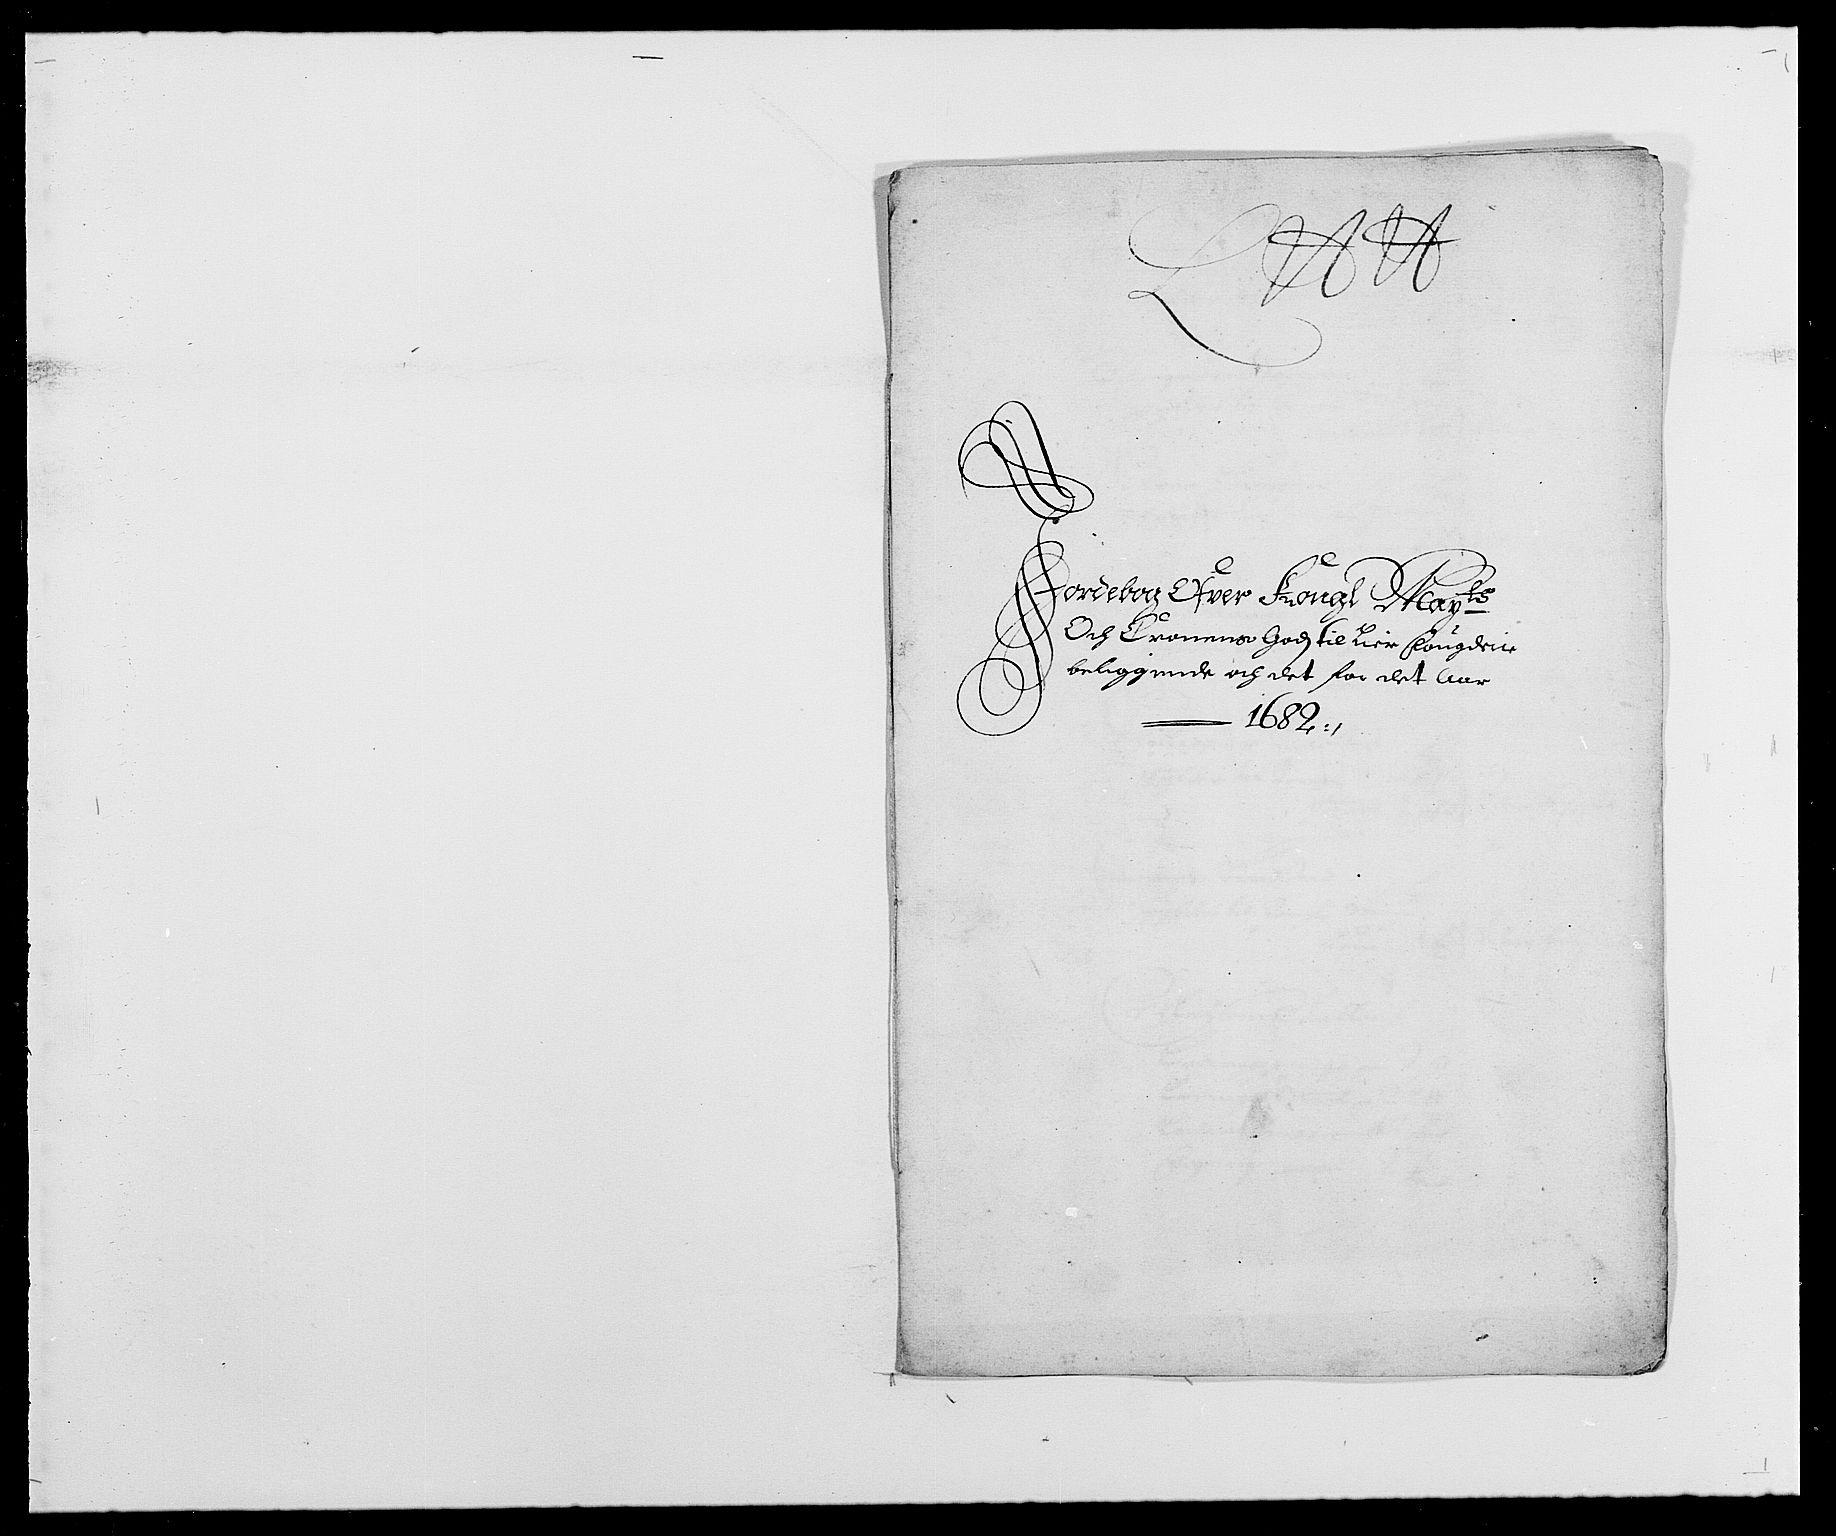 RA, Rentekammeret inntil 1814, Reviderte regnskaper, Fogderegnskap, R27/L1686: Fogderegnskap Lier, 1678-1686, s. 368